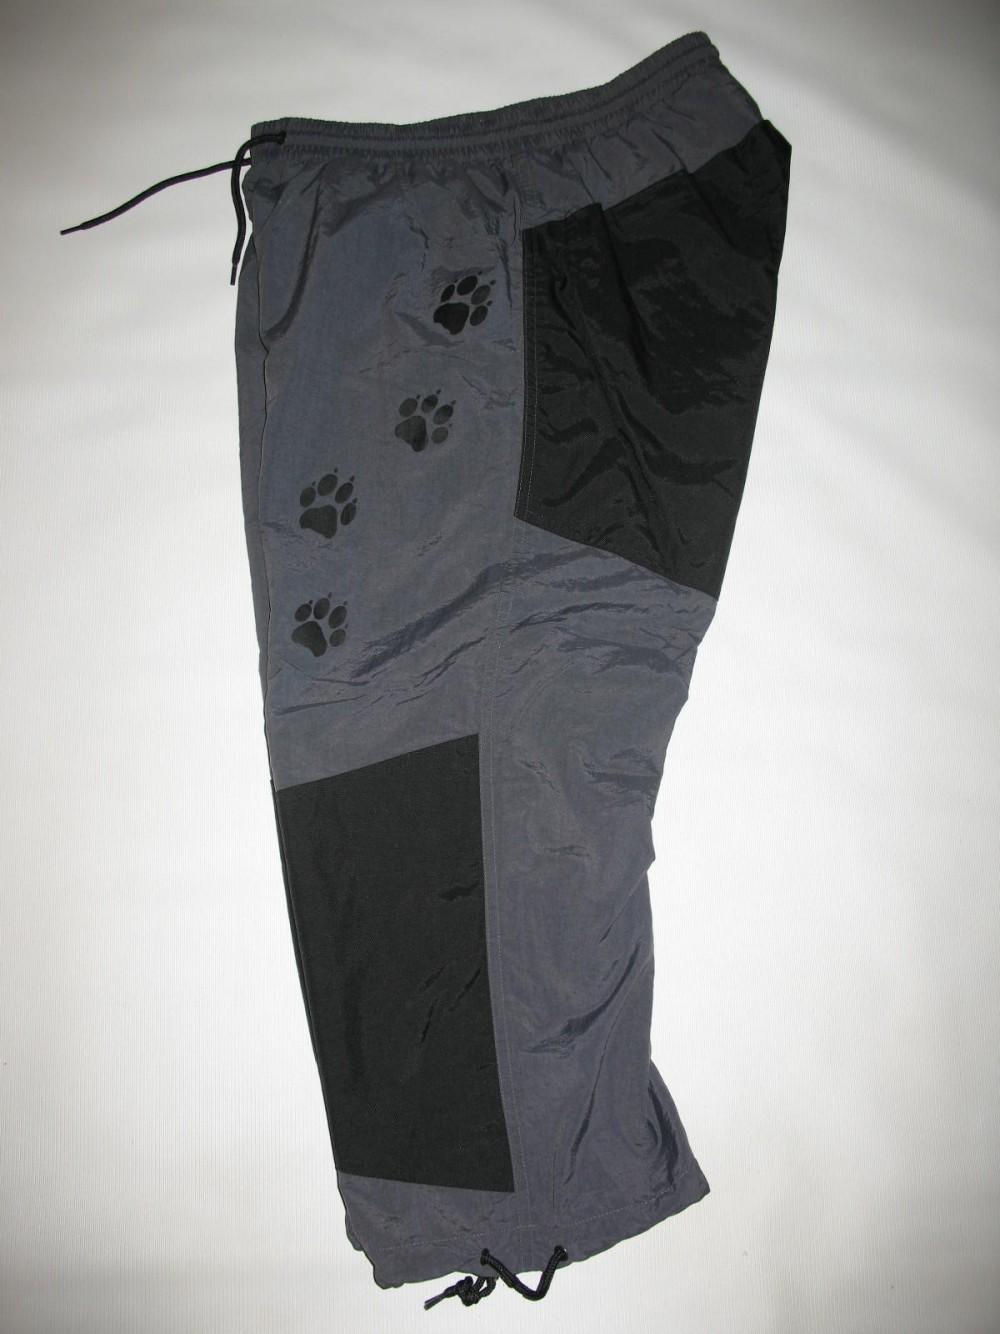 Шорты JACK WOLFSKIN 3/4 pants unisex (размер М) - 3